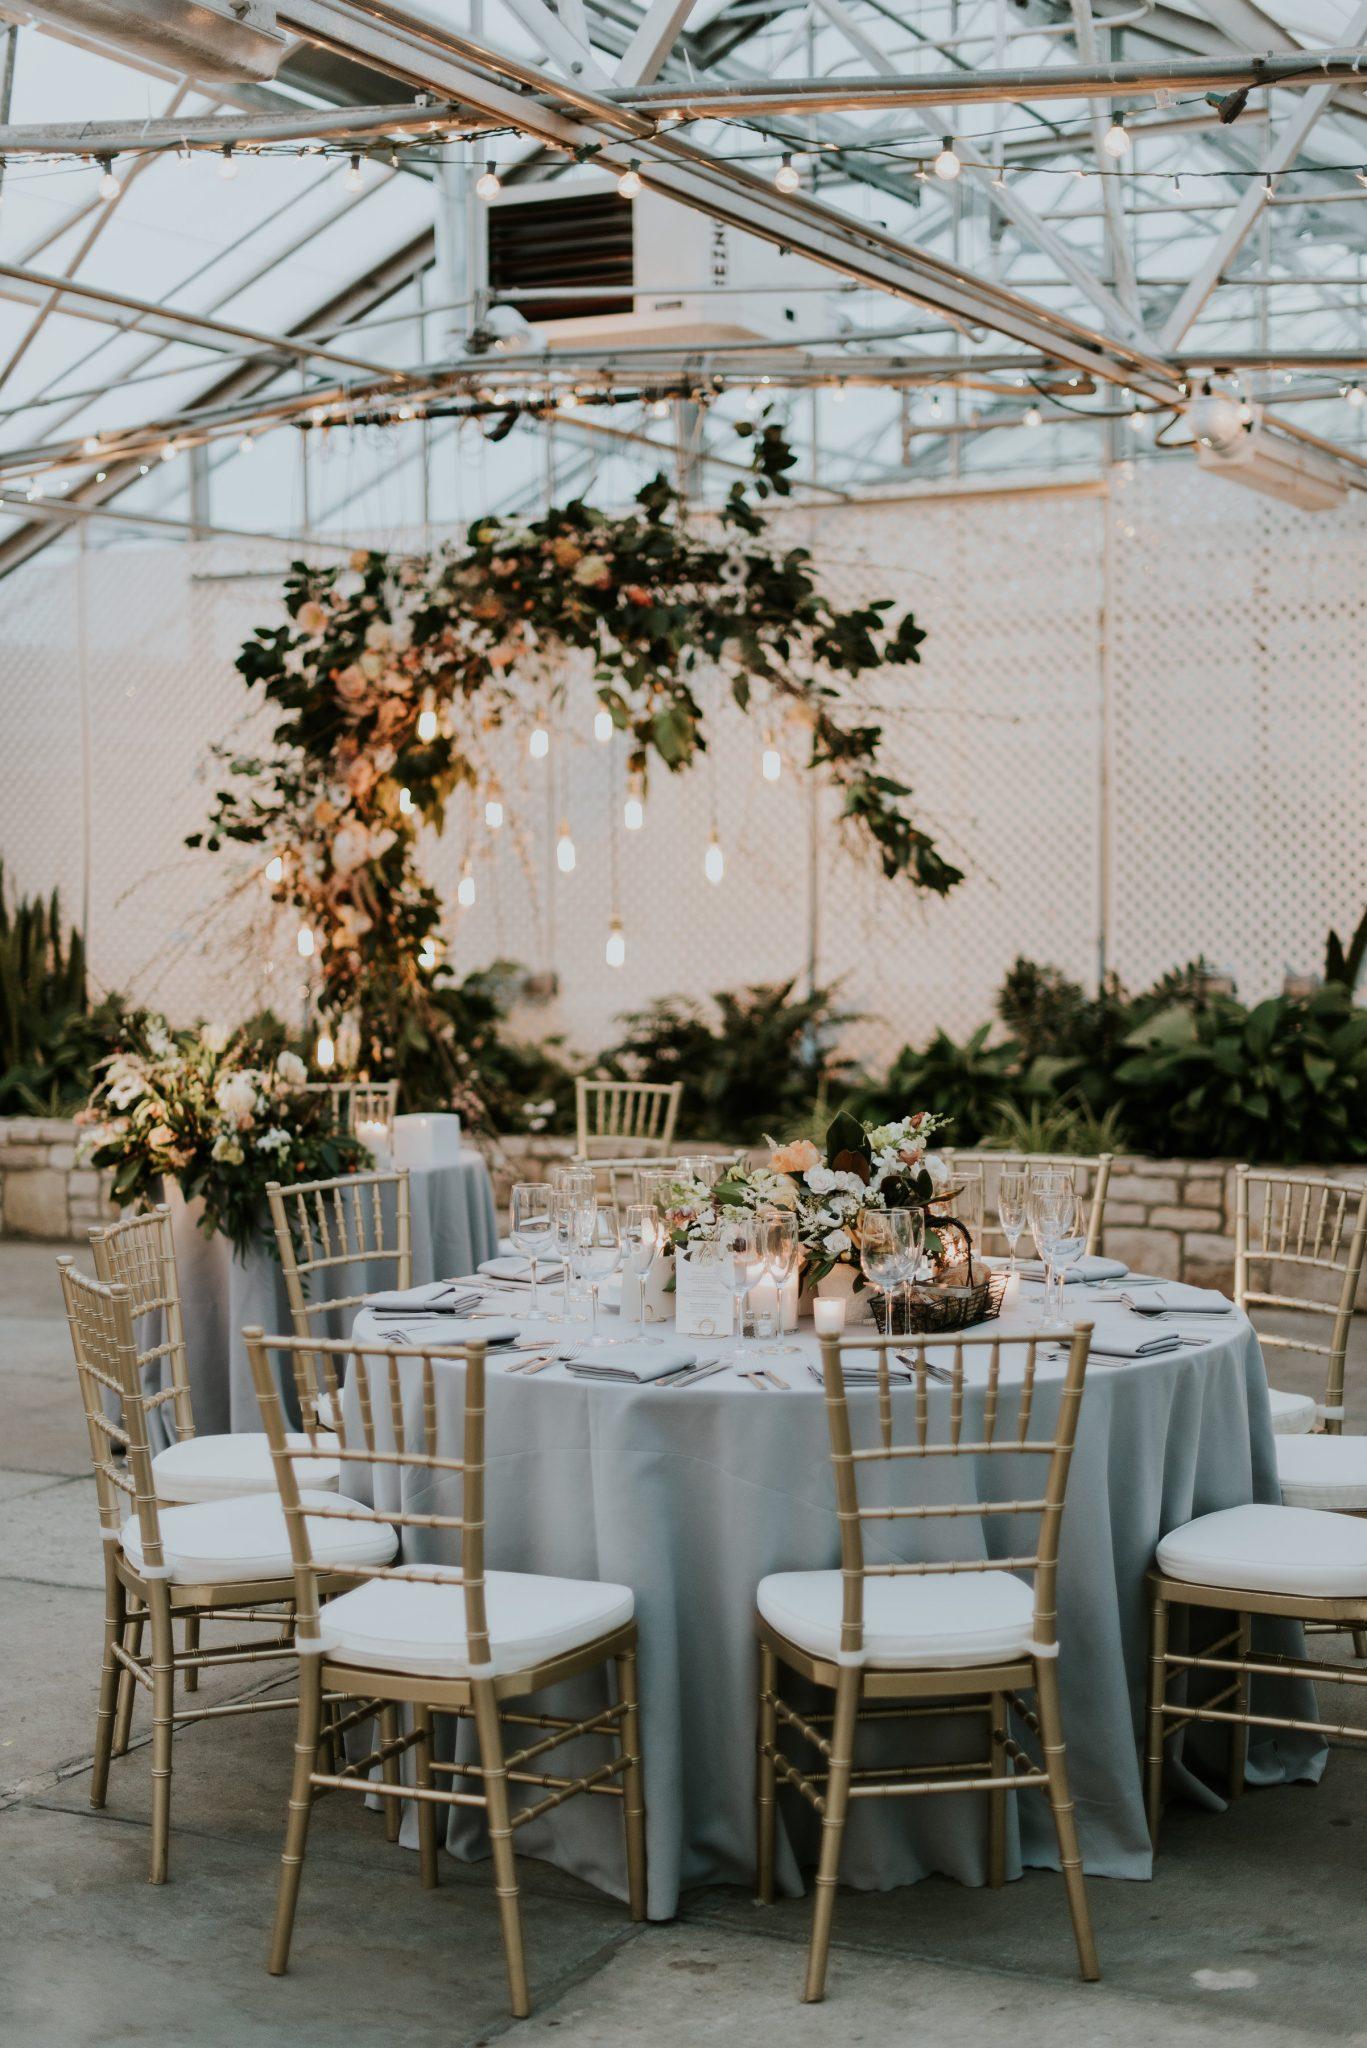 Philadelphia Horticultural Center Starr Events Styled Bride